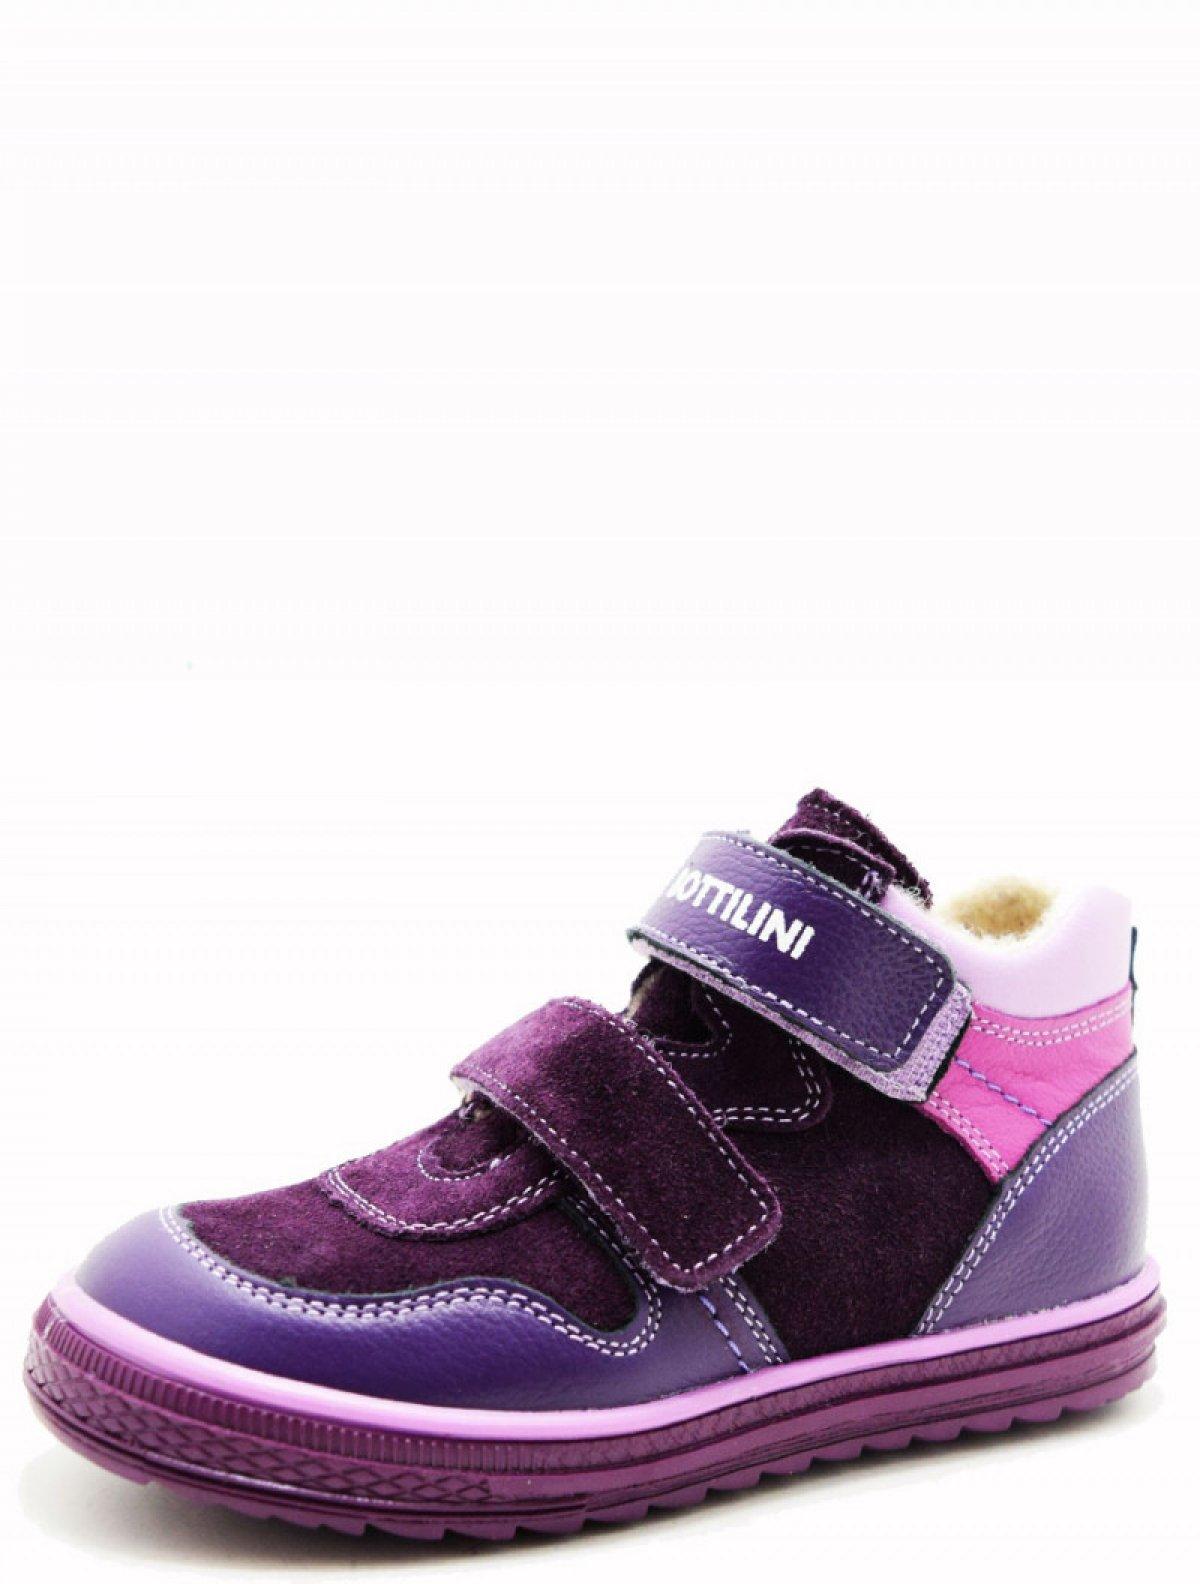 Bottilini BL-106(7) ботинки для девочки